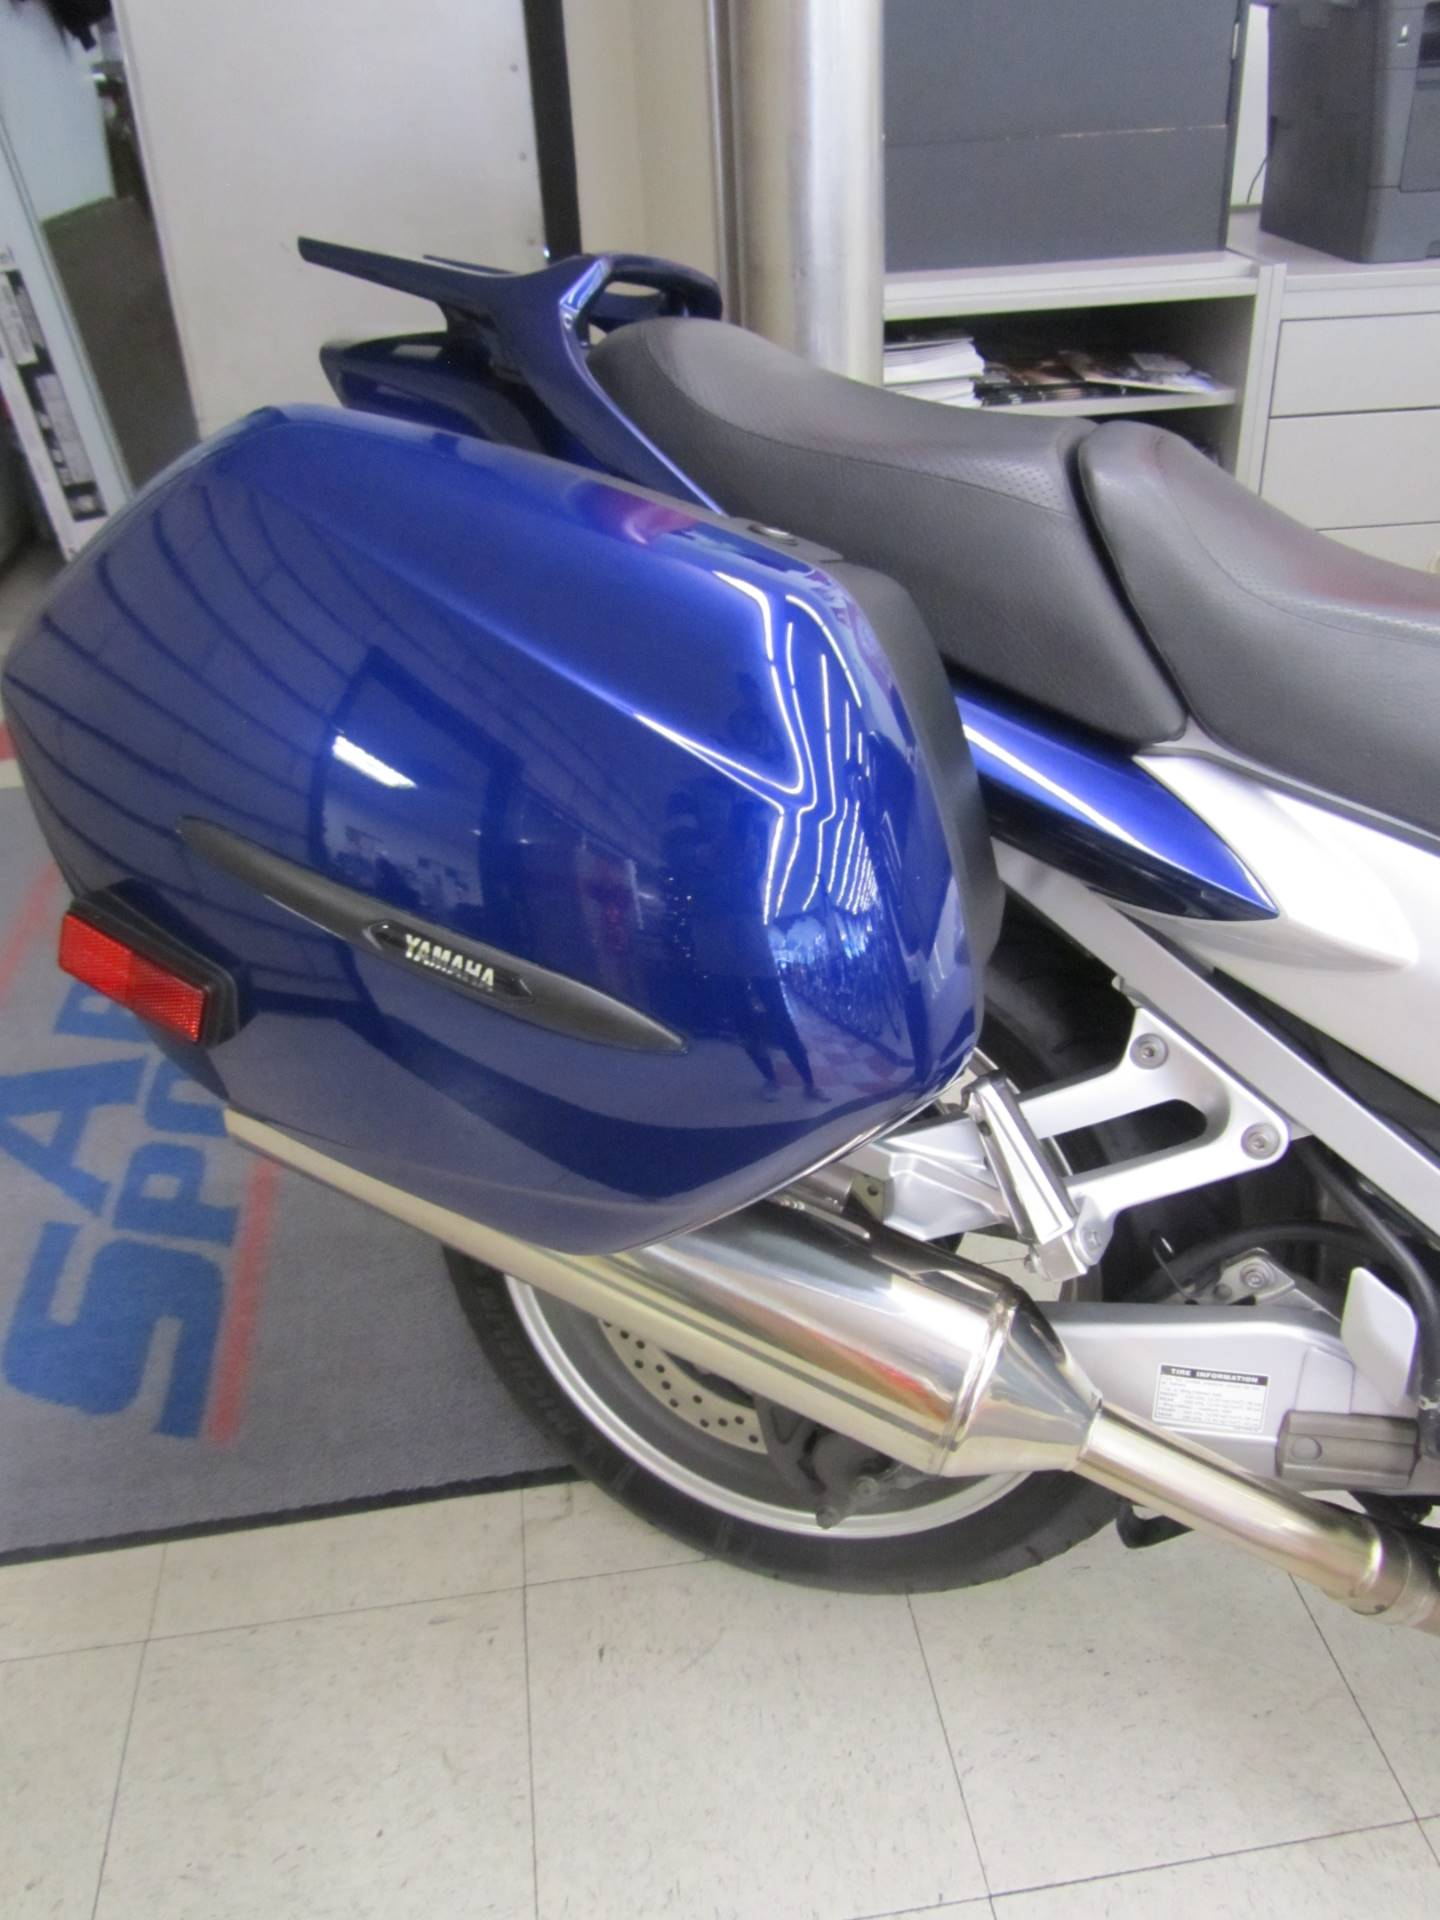 2005 Yamaha FJR 1300A 7